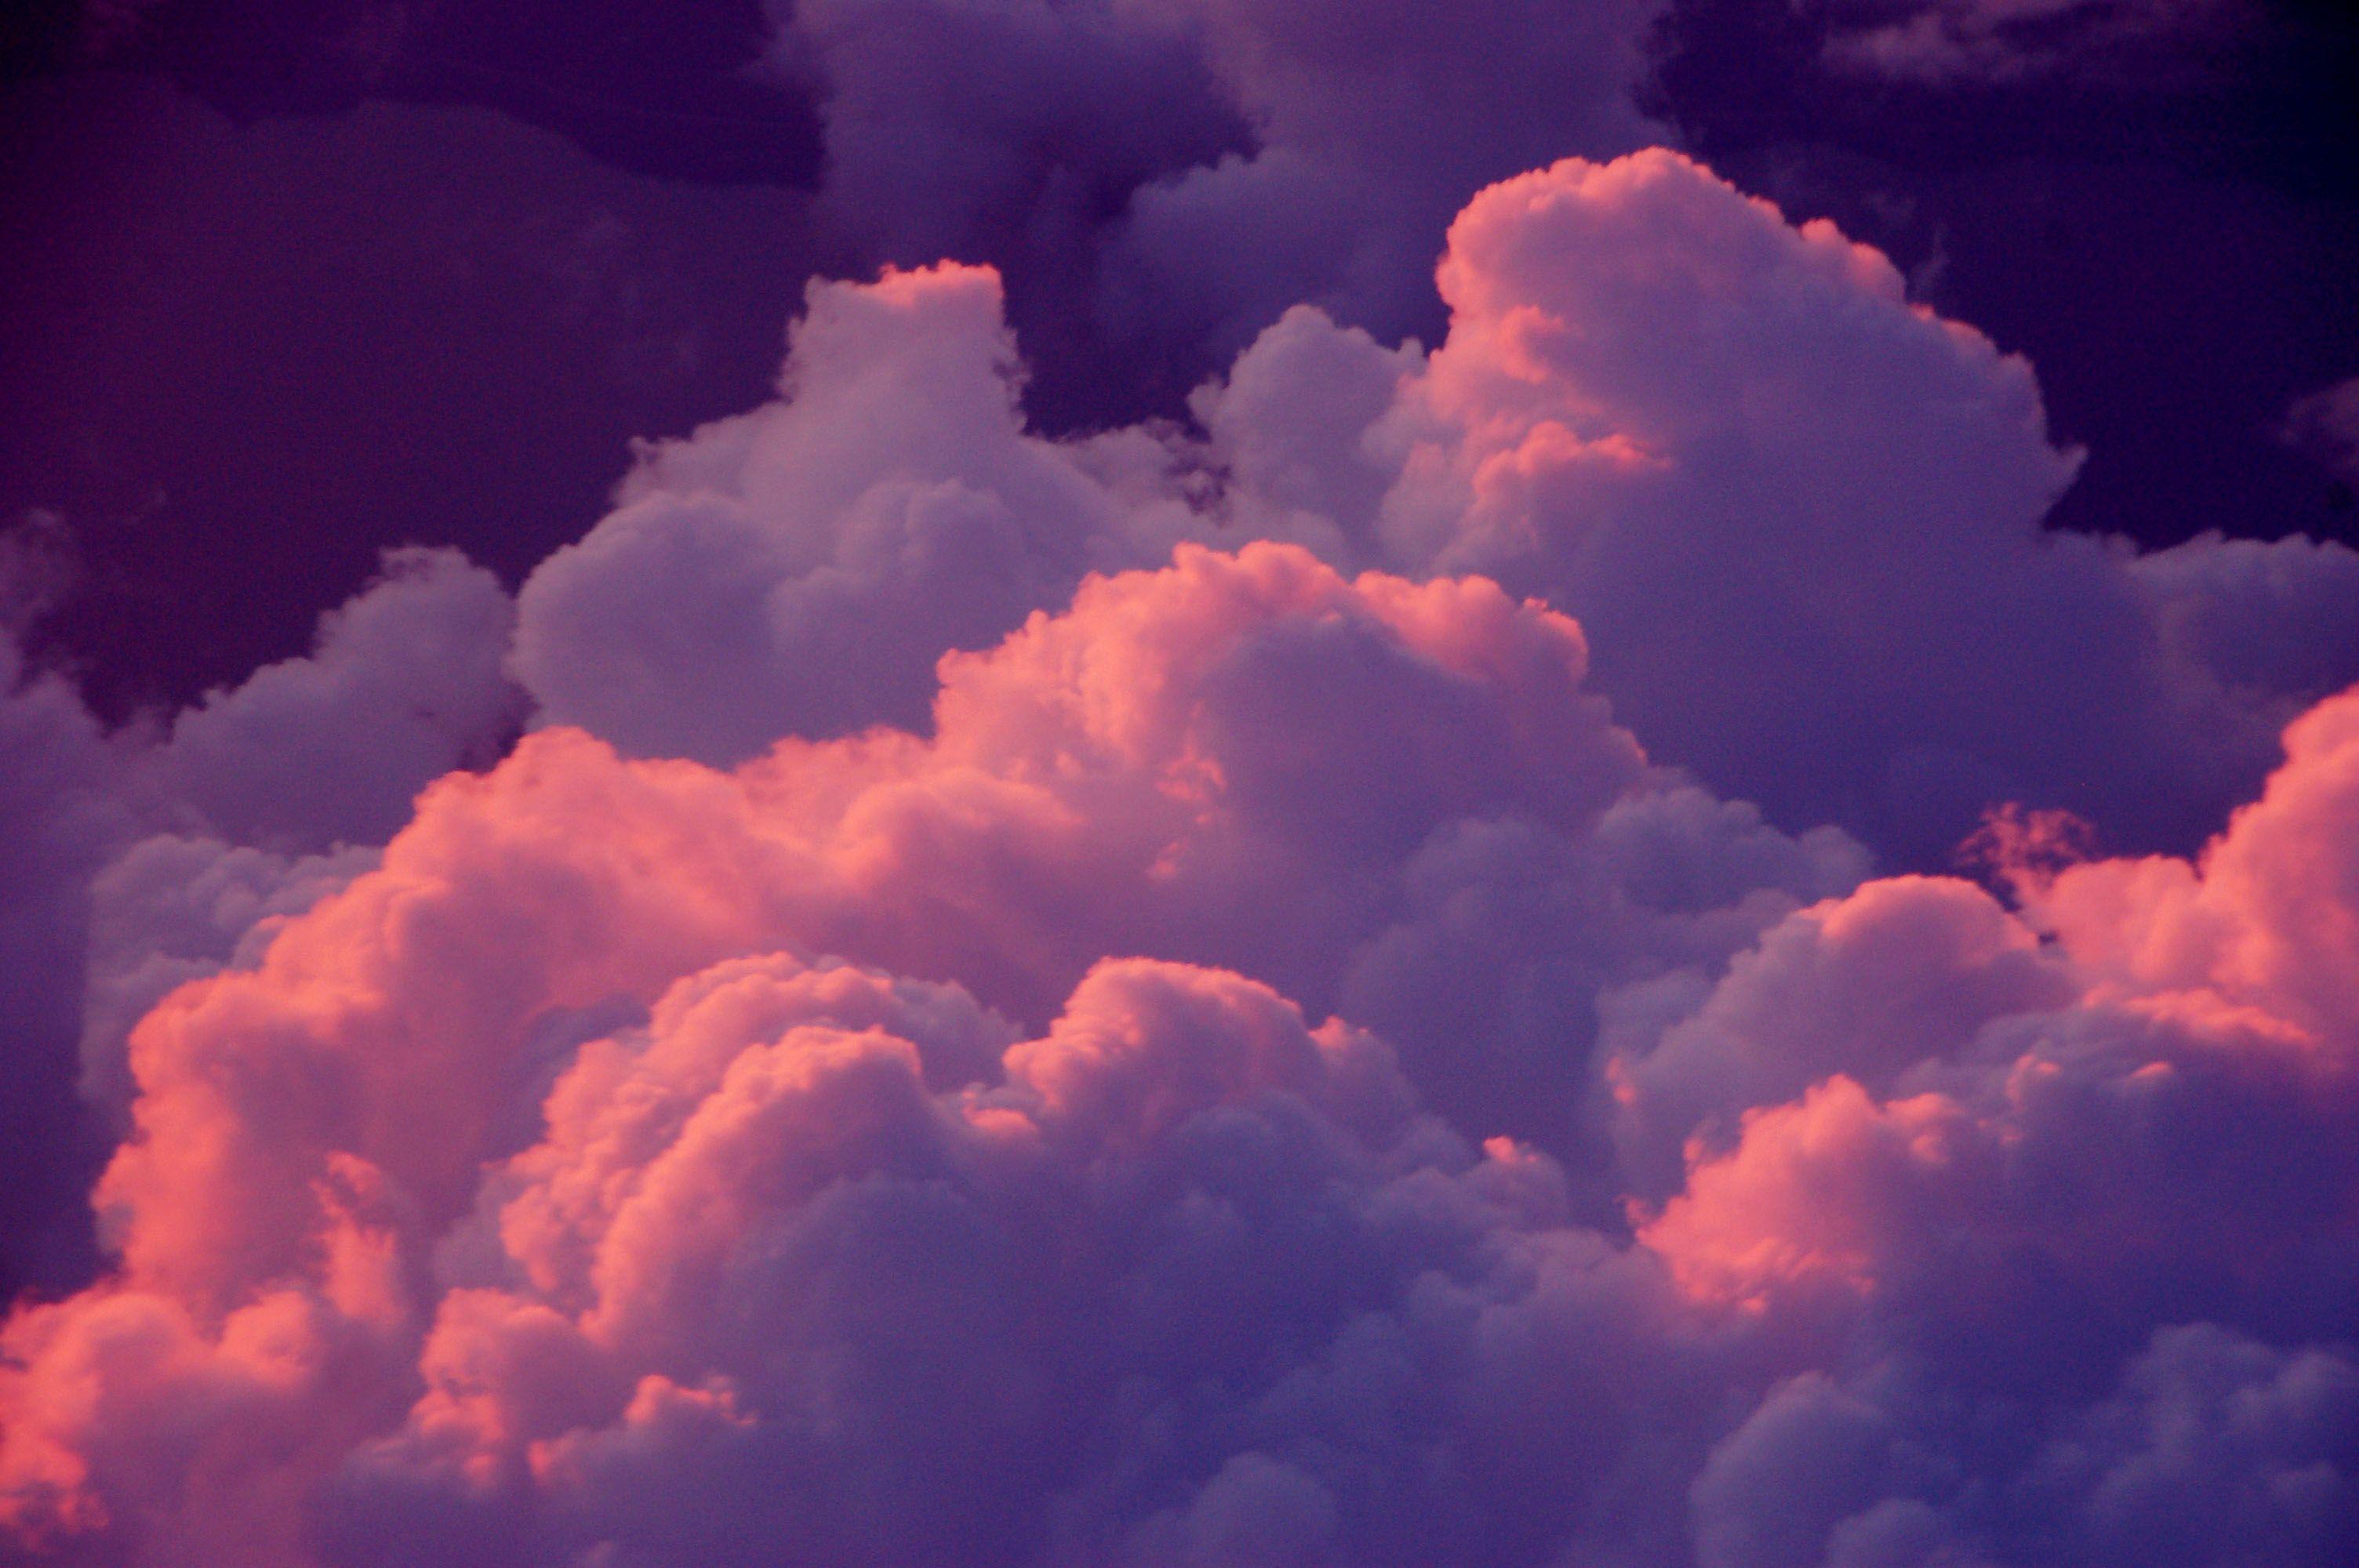 Aesthetic Clouds Mac Wallpapers - Top ...